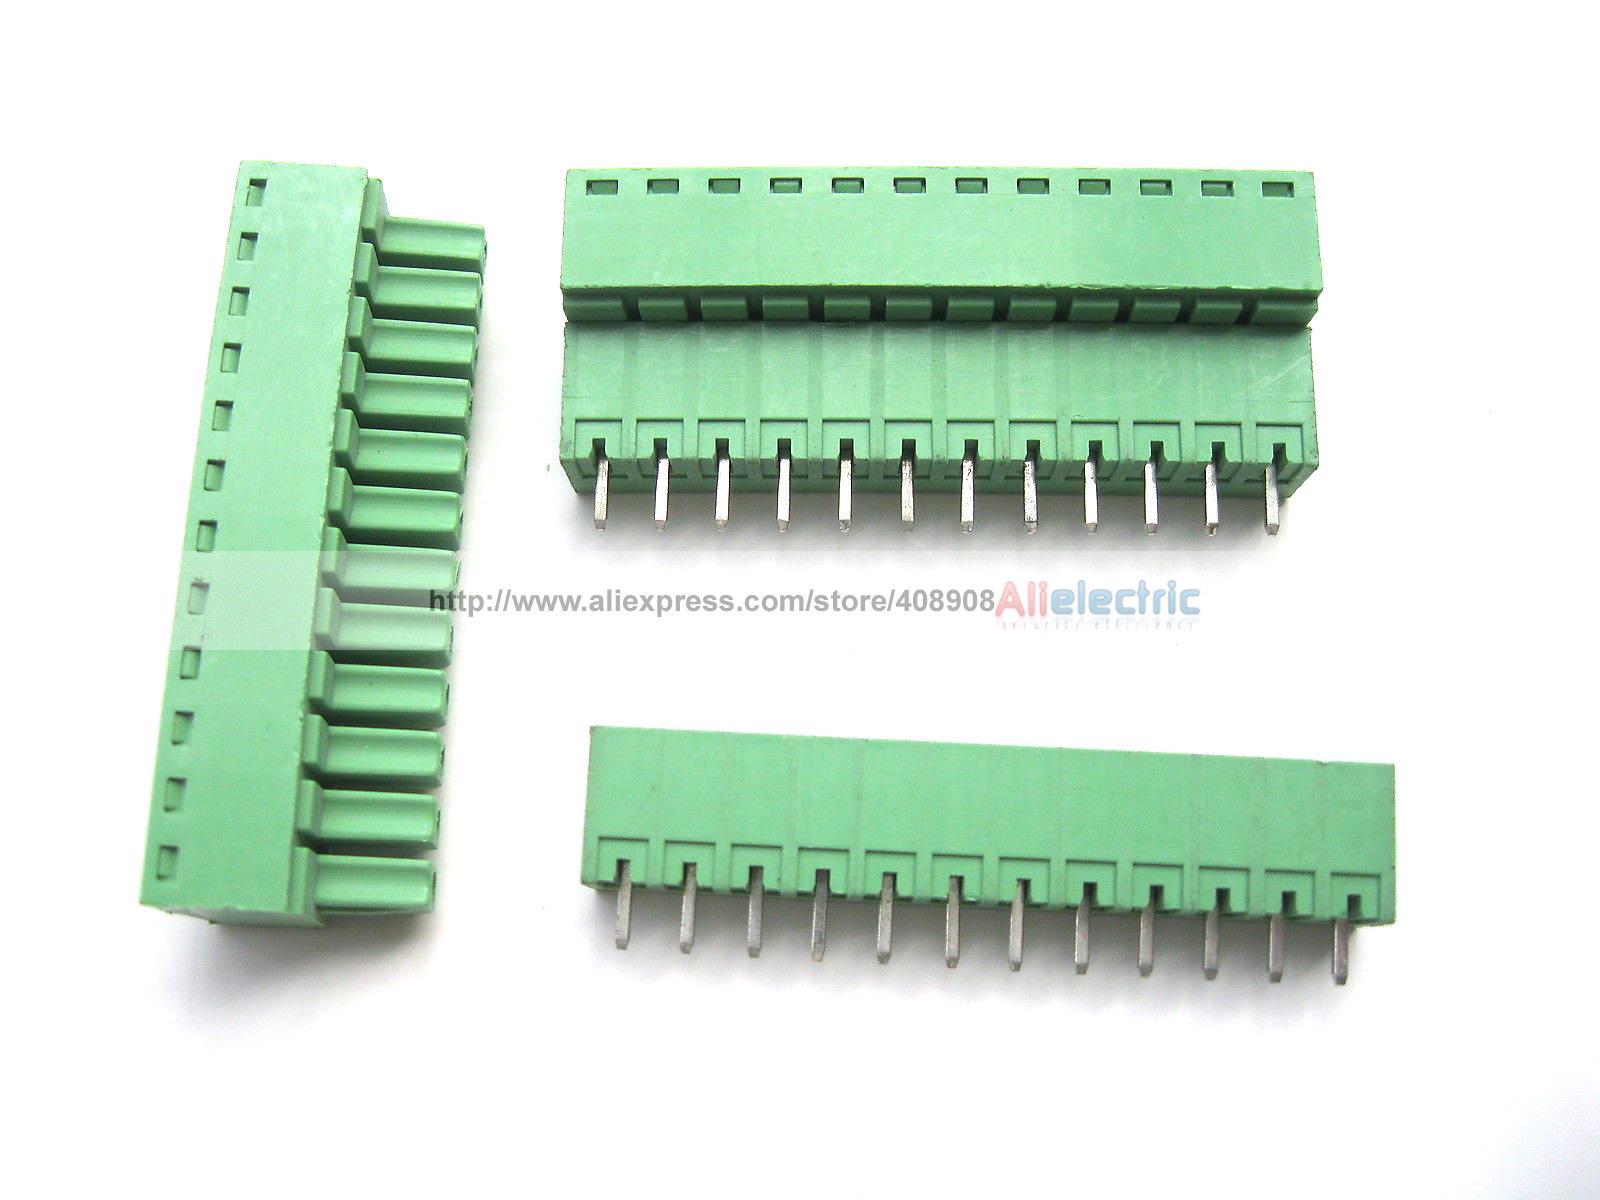 12 Pcs Screw Terminal Block Connector 3.5mm 12 Pin Green Pluggable Type 50 pcs 5 08mm angle 8 pin screw terminal block connector pluggable type green